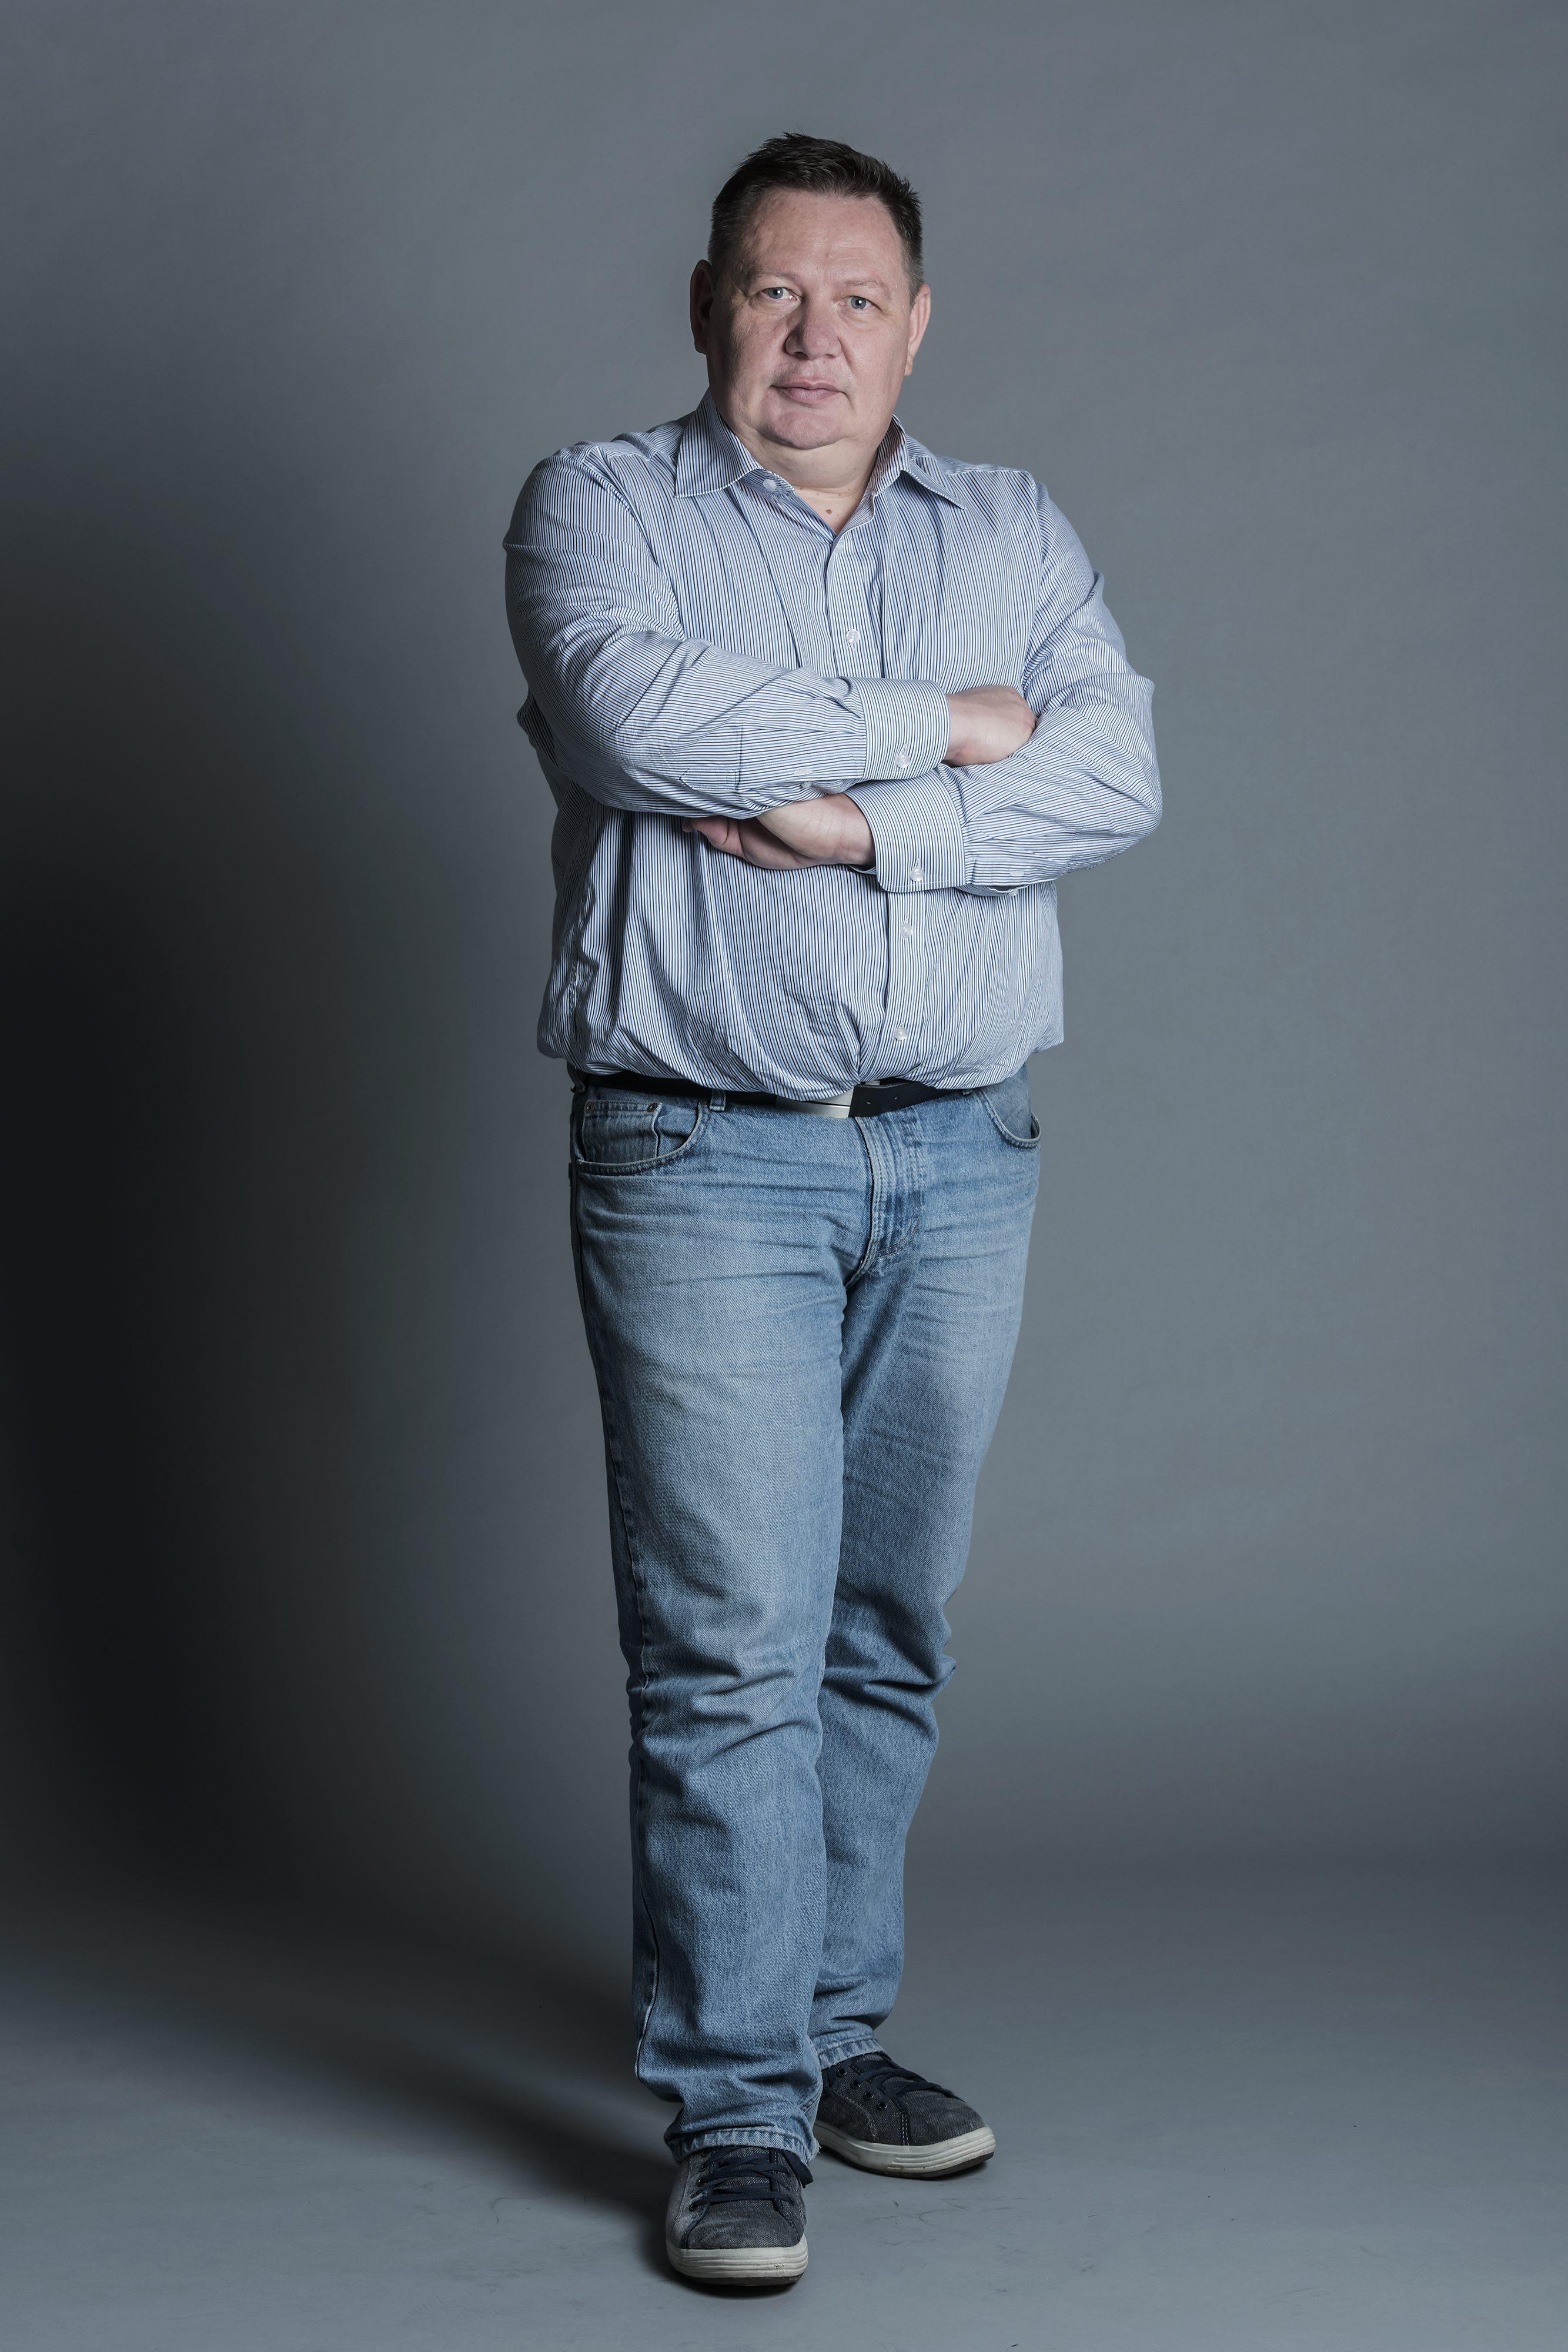 Zagreb, 101017.  Stanko Cerin, direktor Ostendo consulting. Clan zirija za Hanza media Smart city nagrada Jutarnjeg lista. Foto: Neja Markicevic / CROPIX